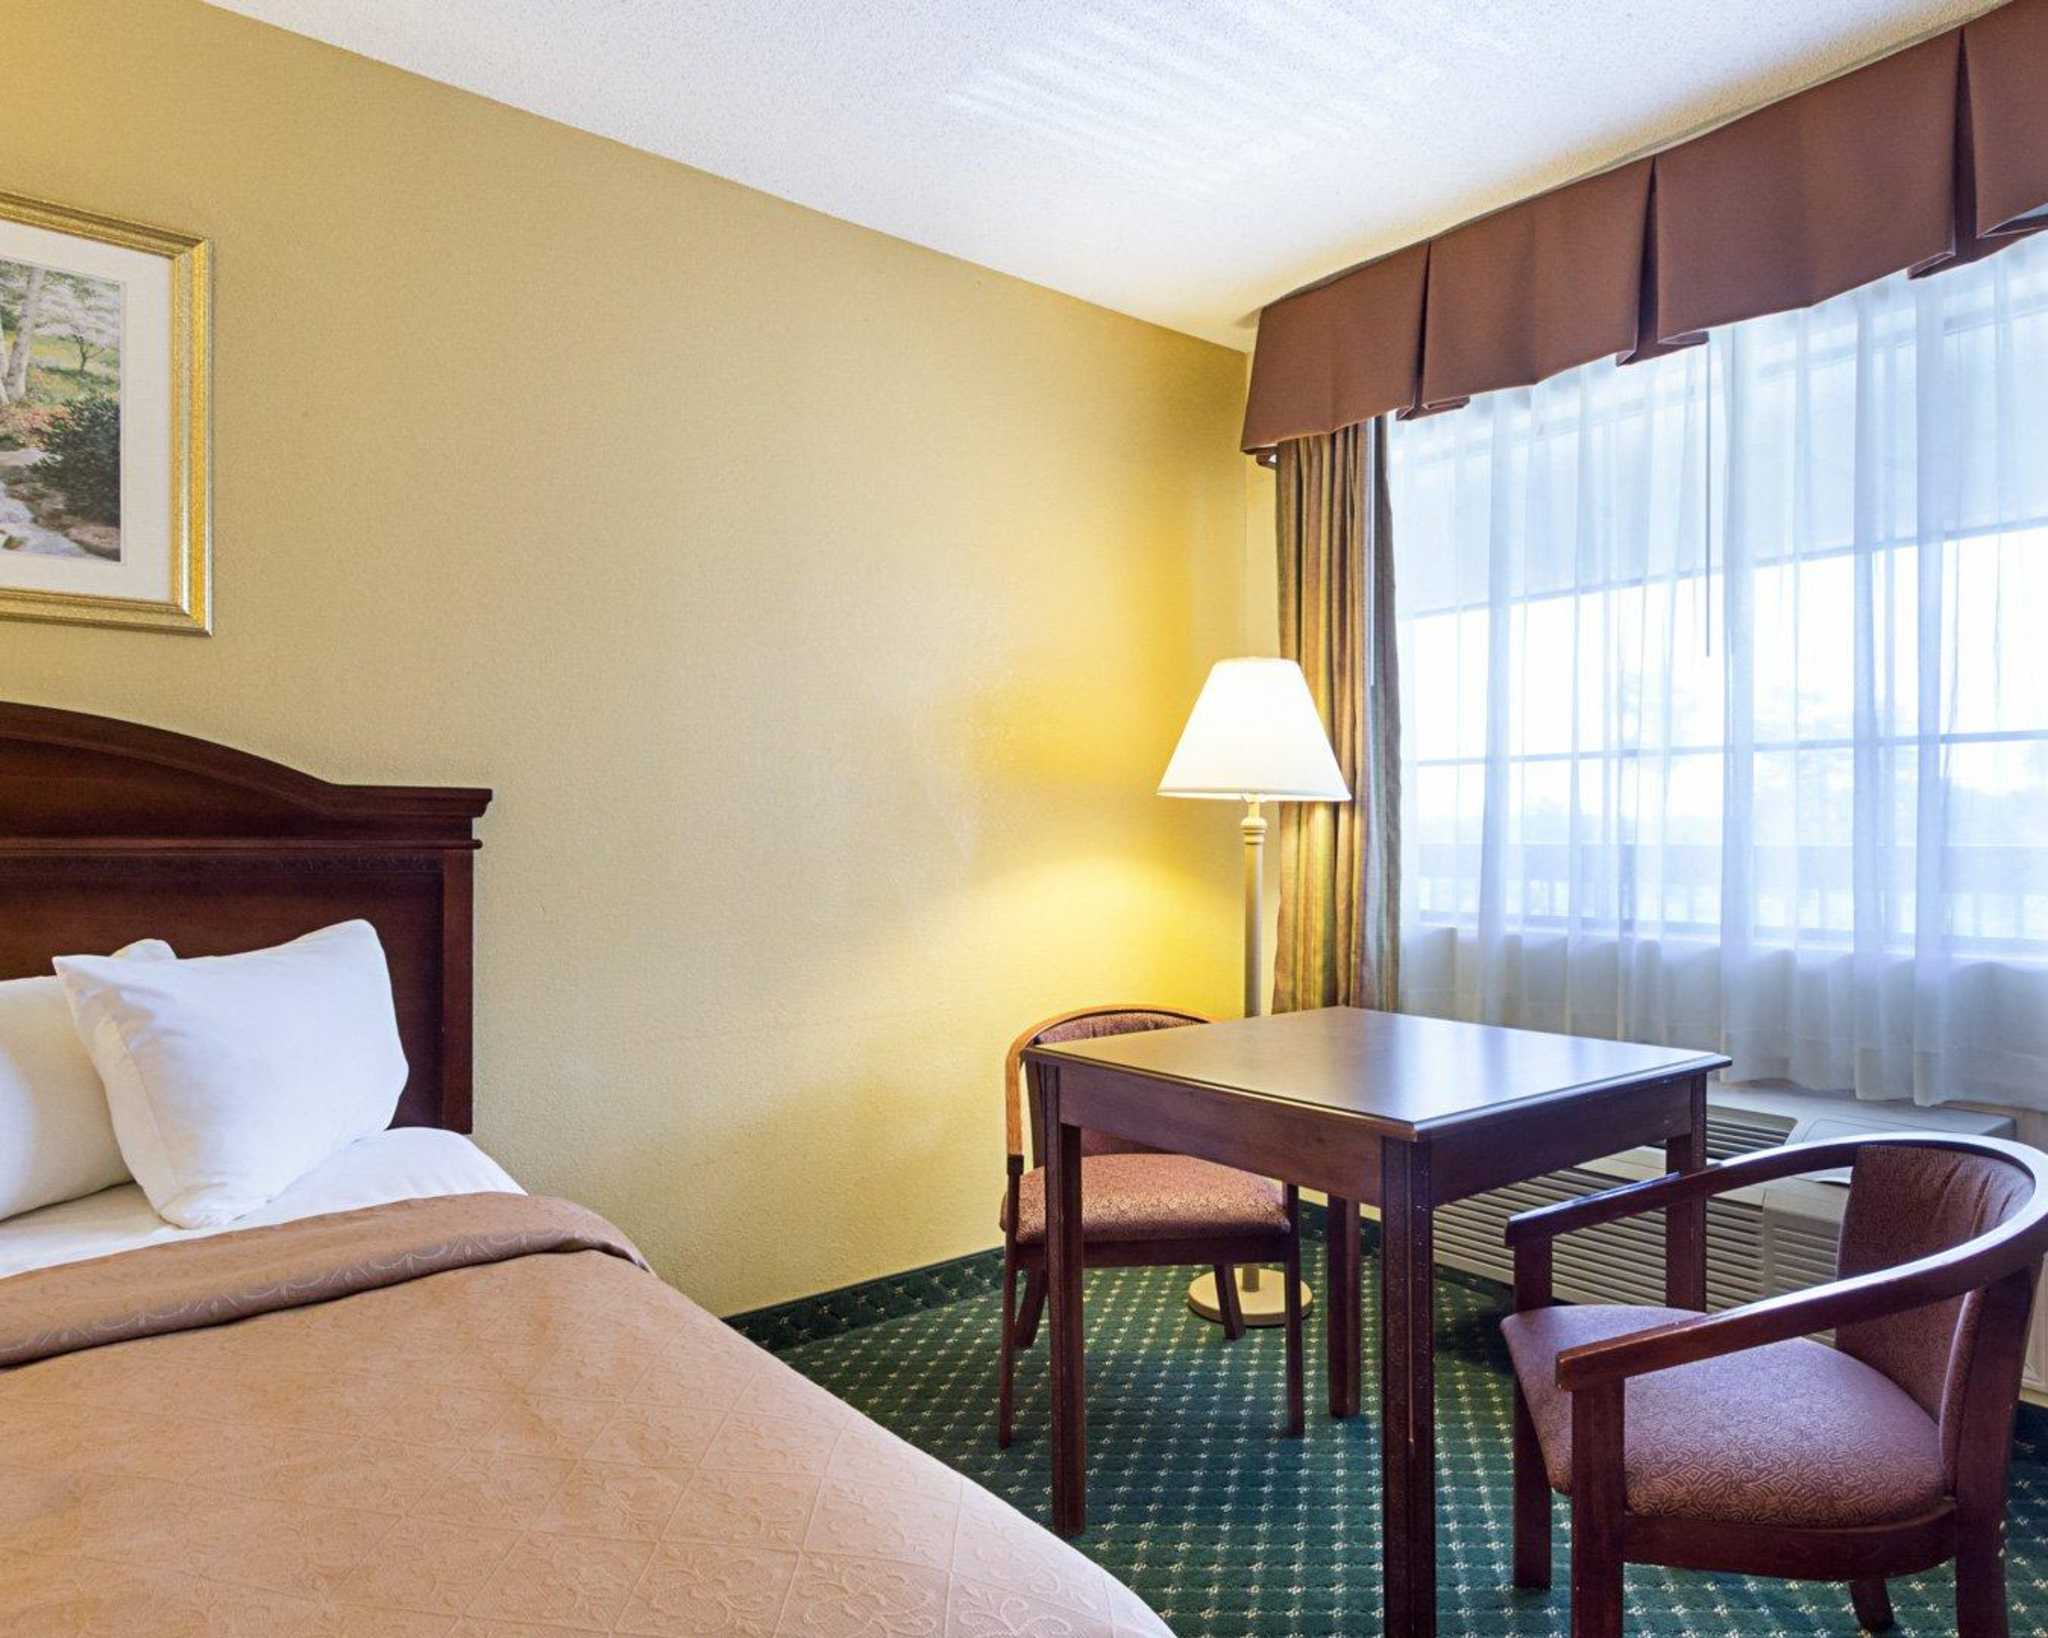 Quality Inn & Suites Southwest image 7